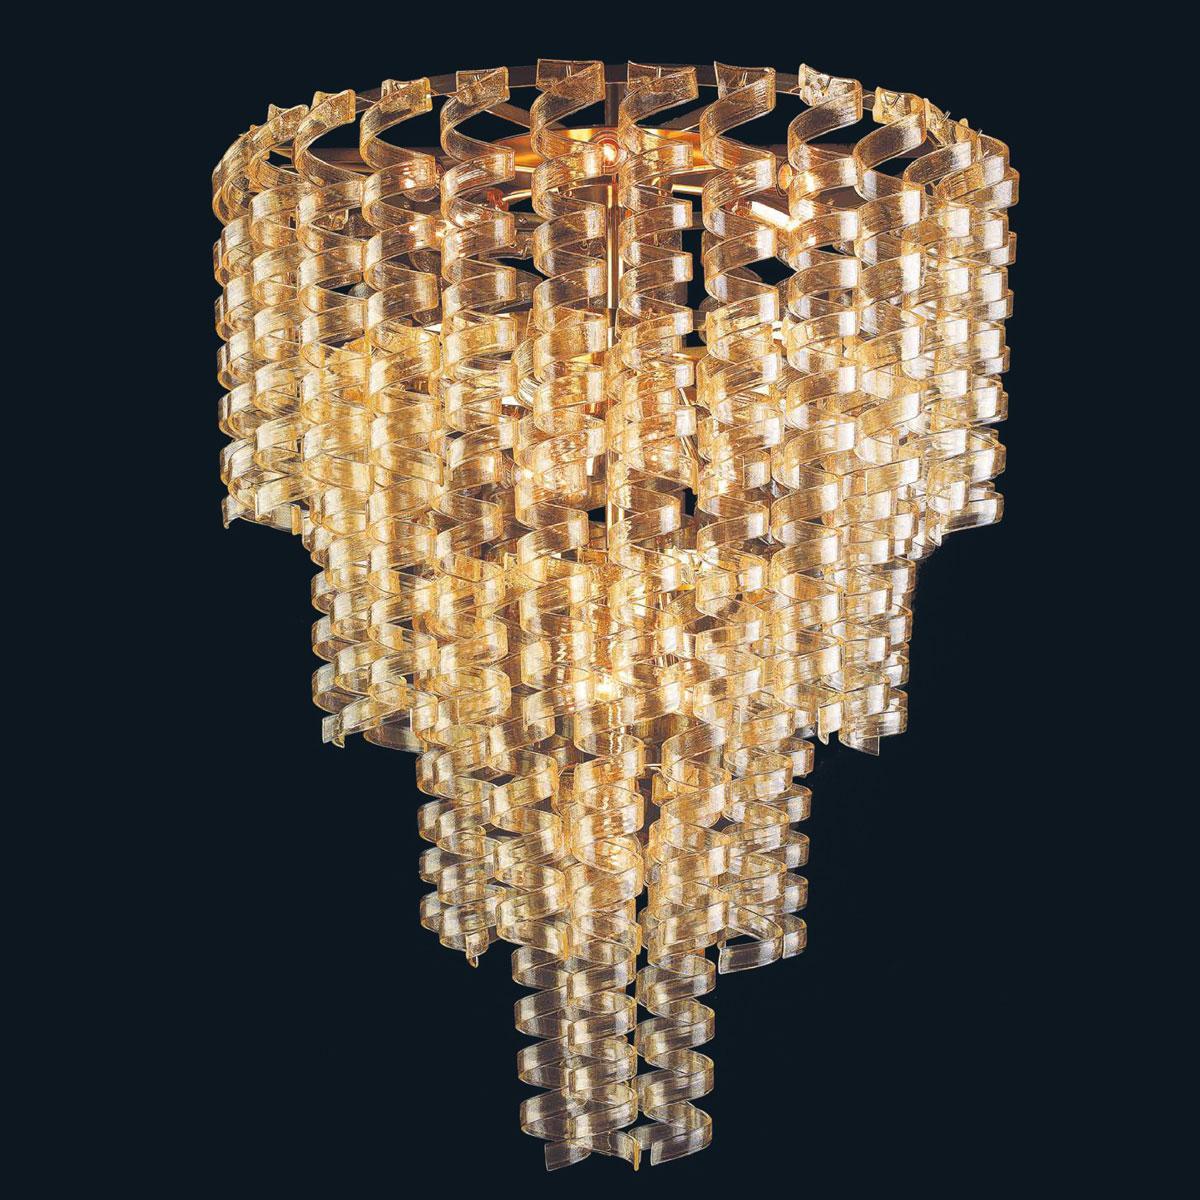 """Adison"" Murano glass pendant light - 13 lights - gold"